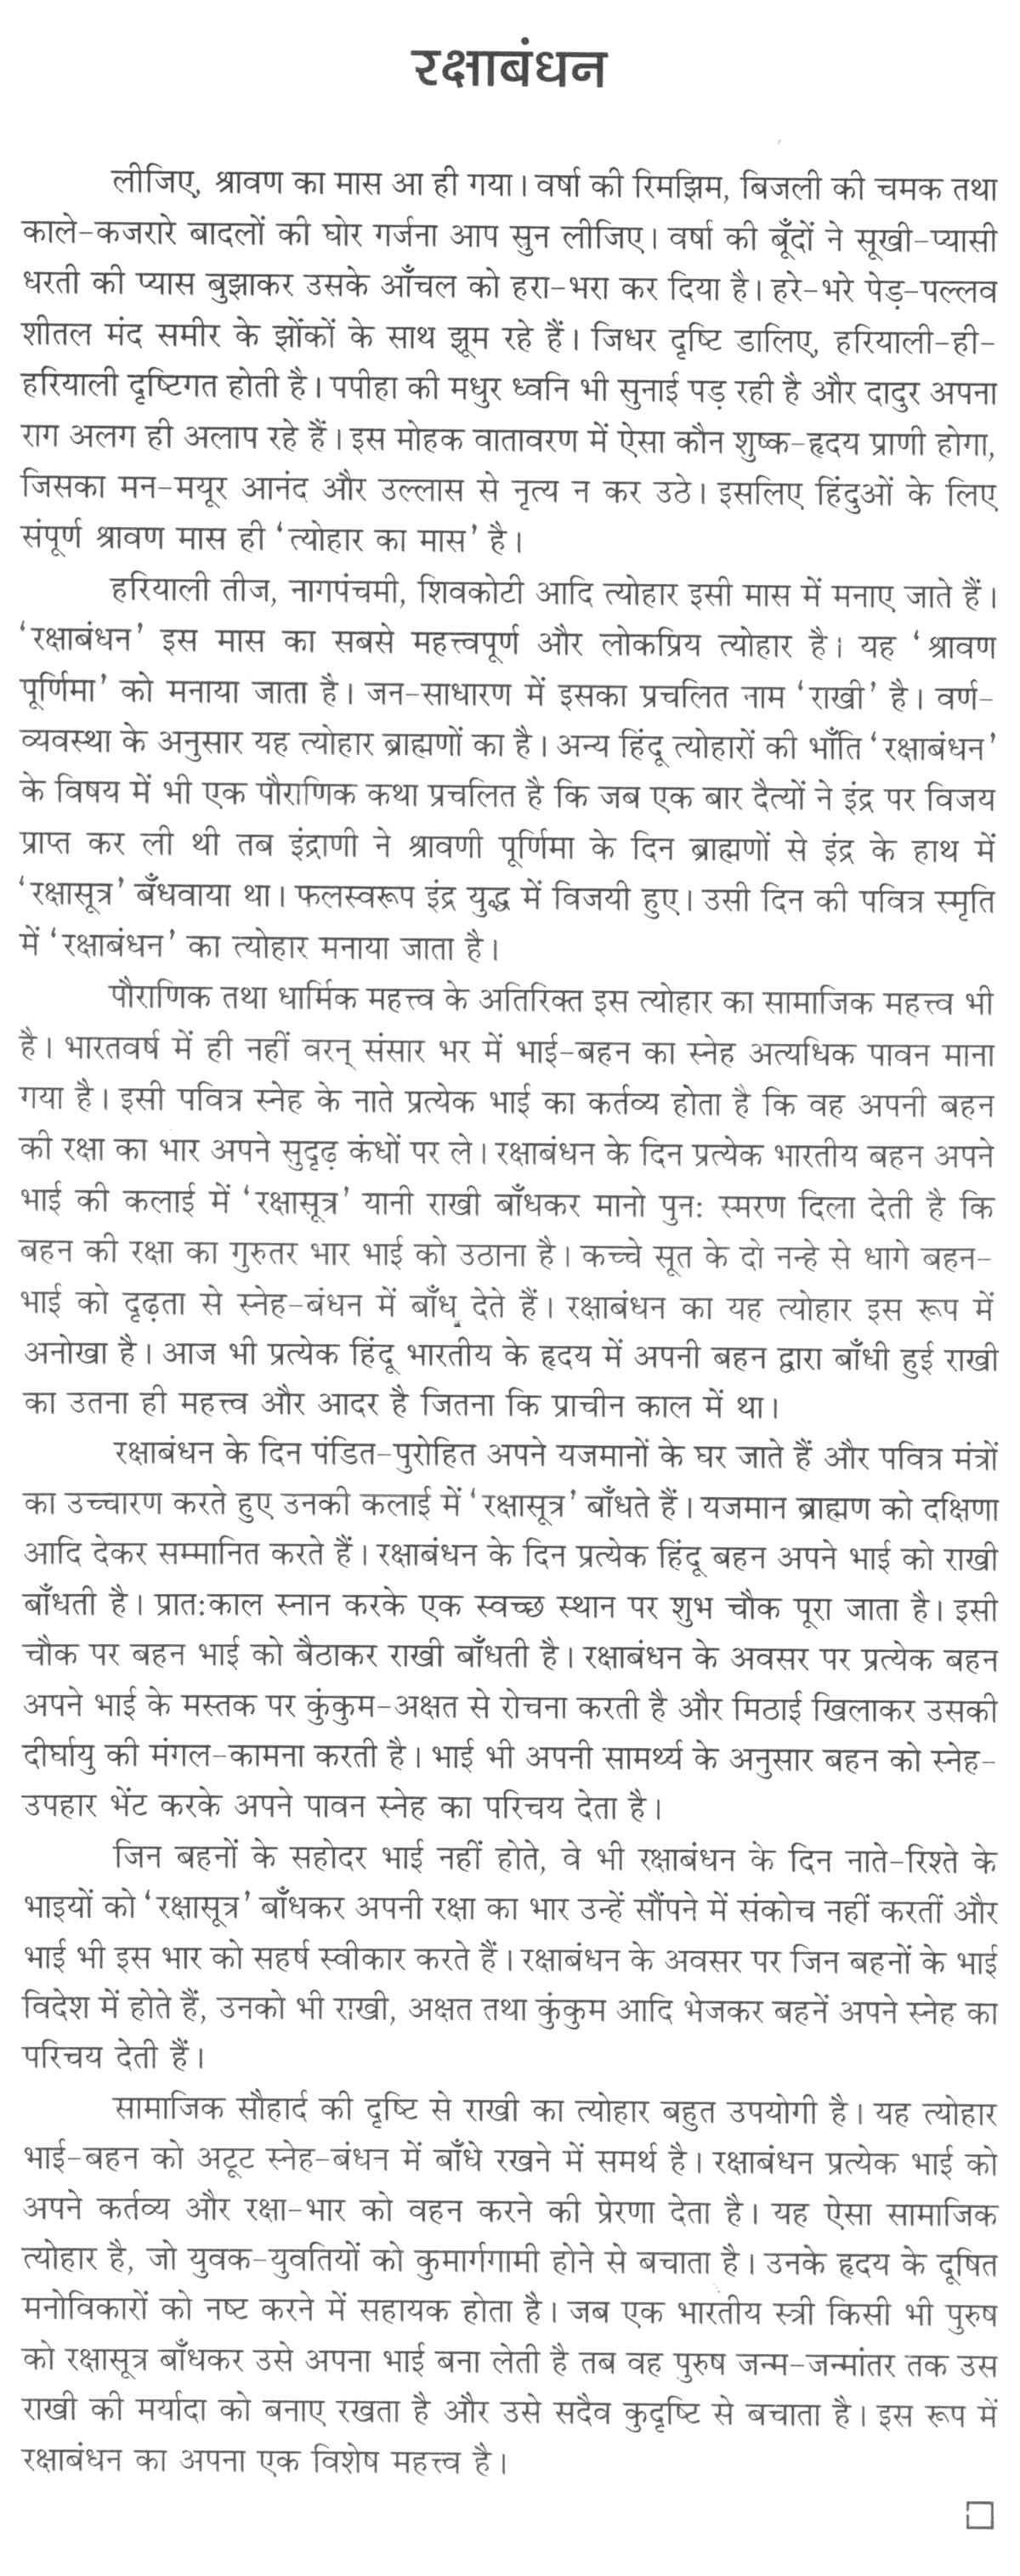 Short Raksha Bandhan Essay  Indian Holidays  Raksha Bandhan Essay  Short Raksha Bandhan Essay Last Year Of High School Essay also Topics For High School Essays  Creative Writing Websites